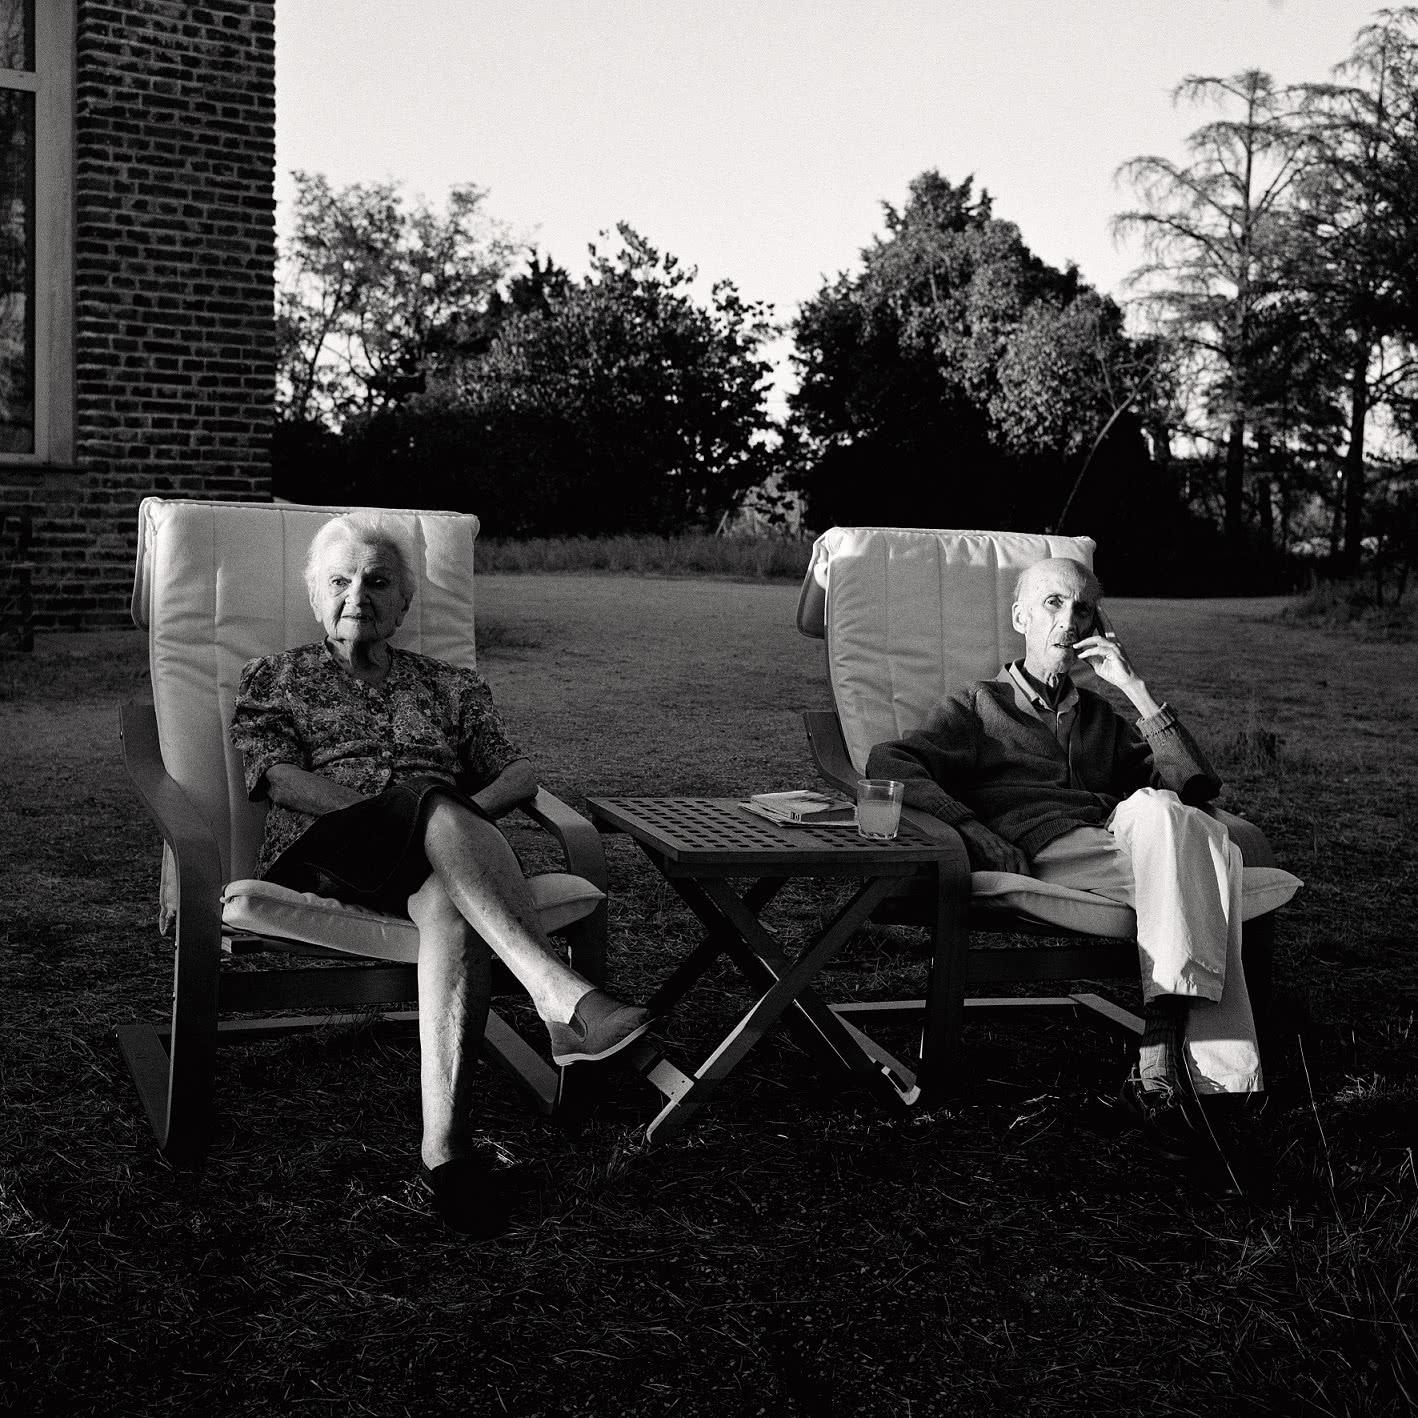 Javier Marquerie Thomas. Carlos e Inke. 2012. Ivorypress.